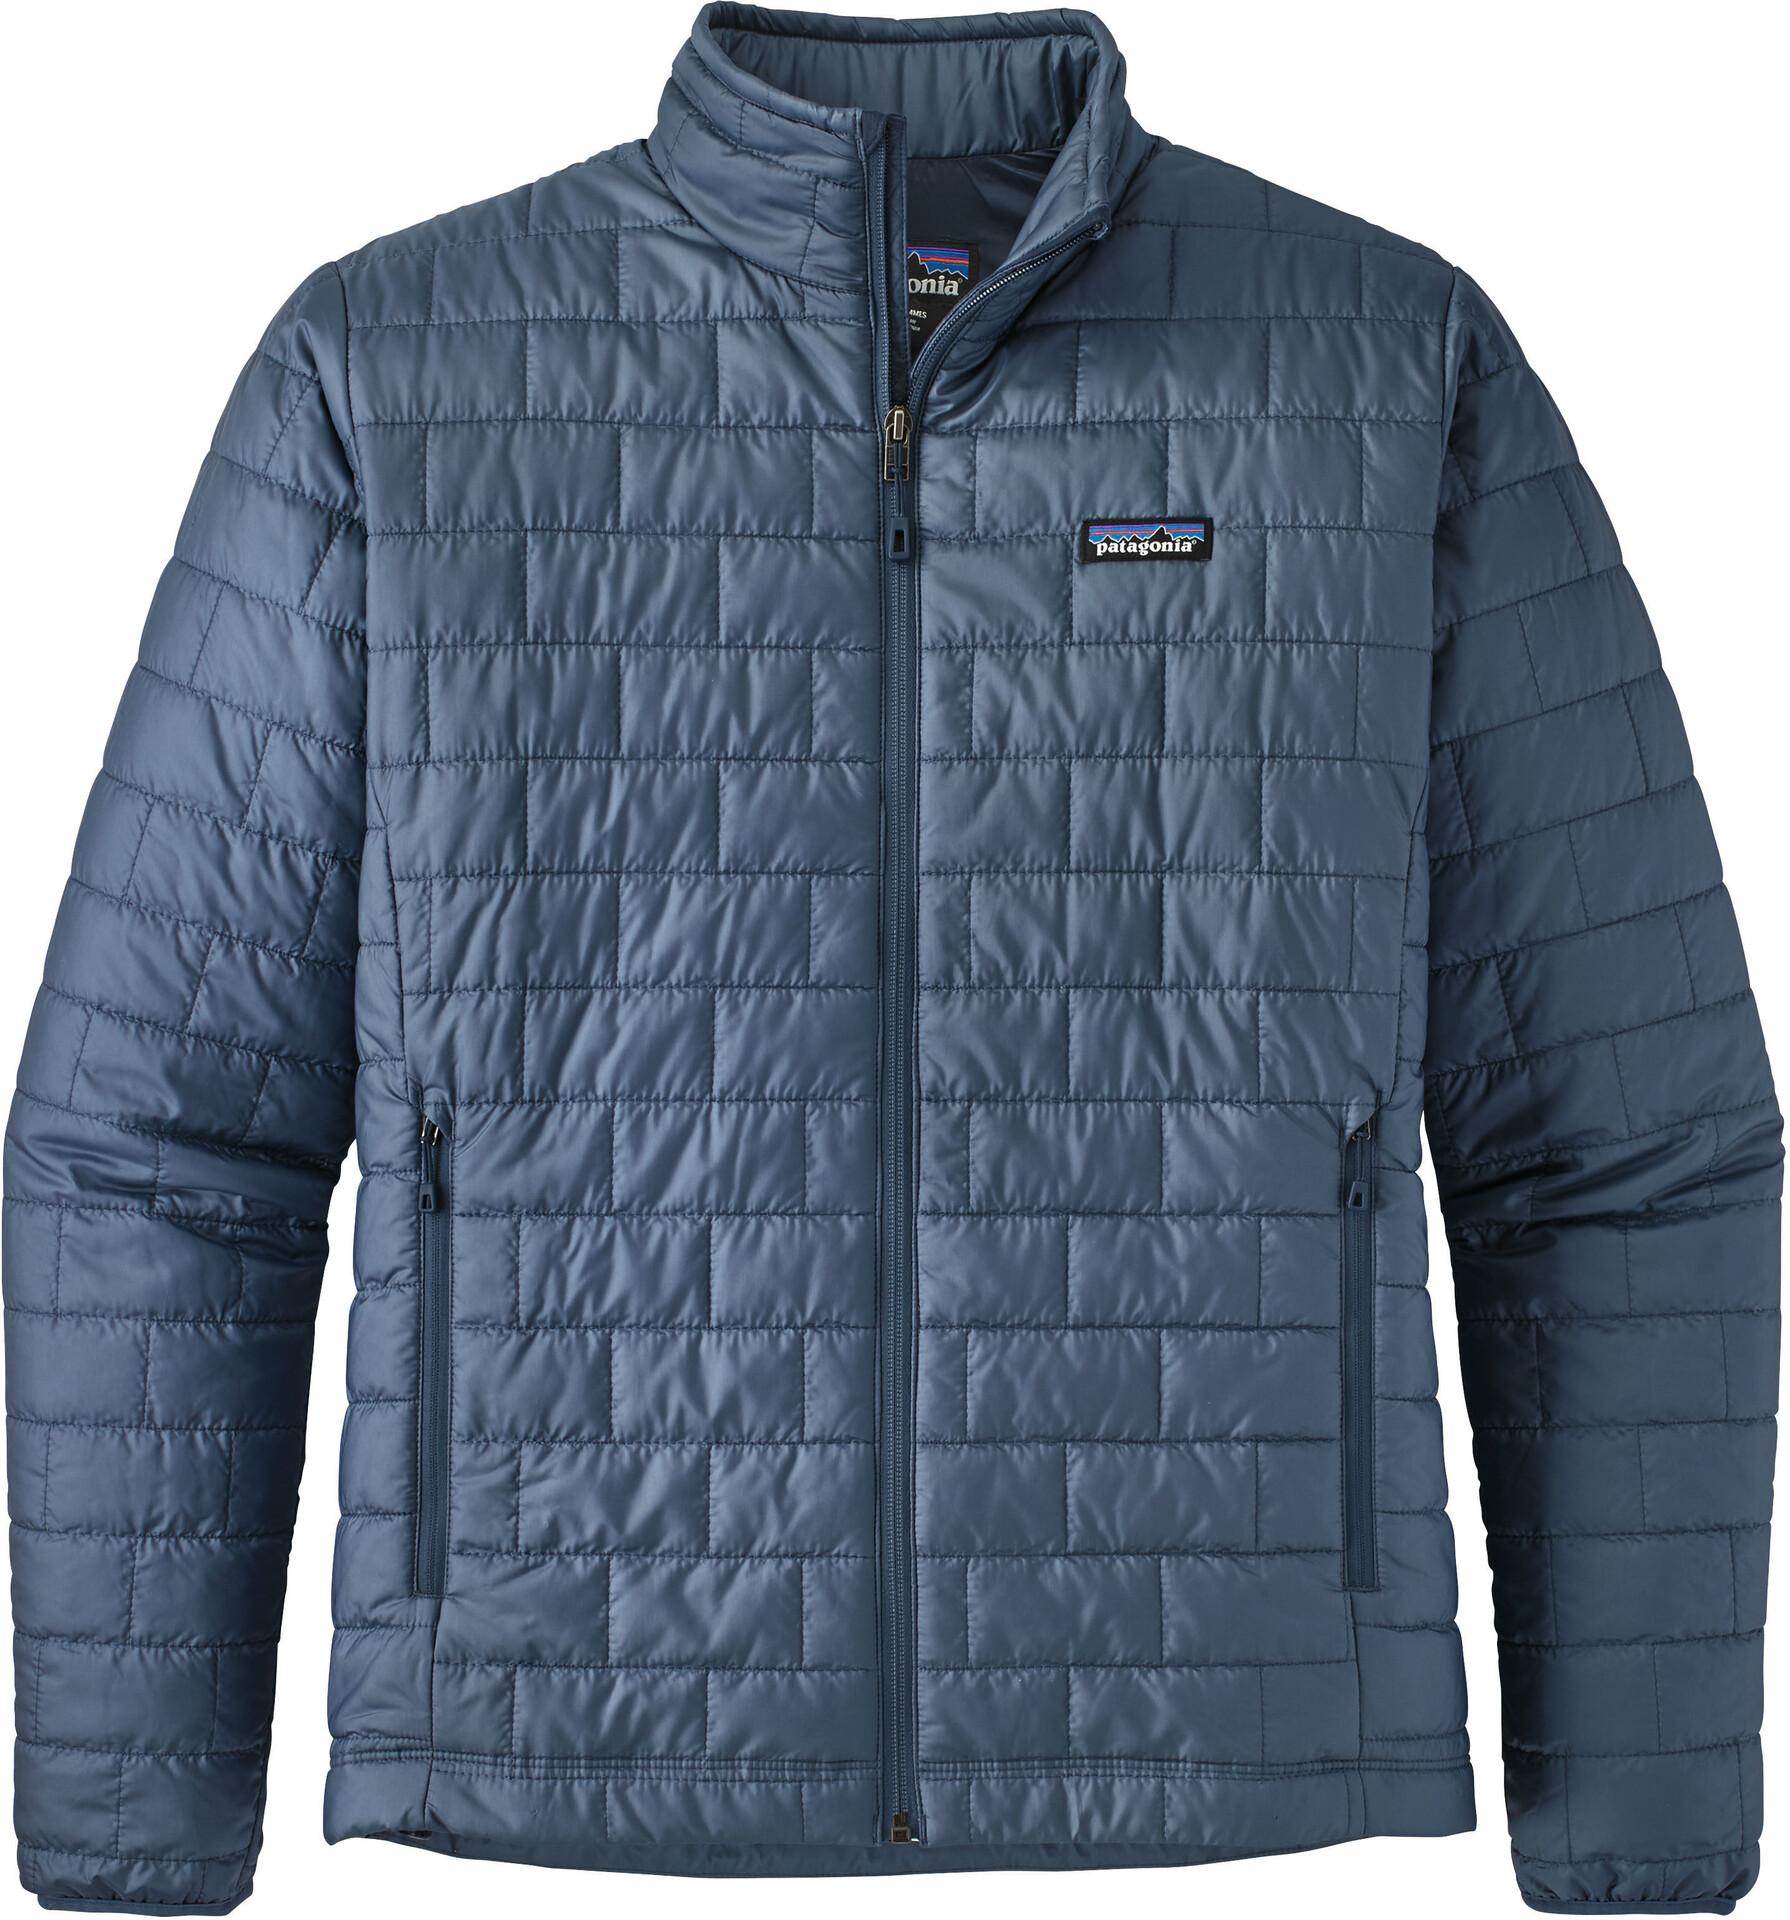 5ec1976638c Manteaux D hiver 2018 Patagonia Nano Puff Bleu Veste Xxl Homme gW0gwSAqxT